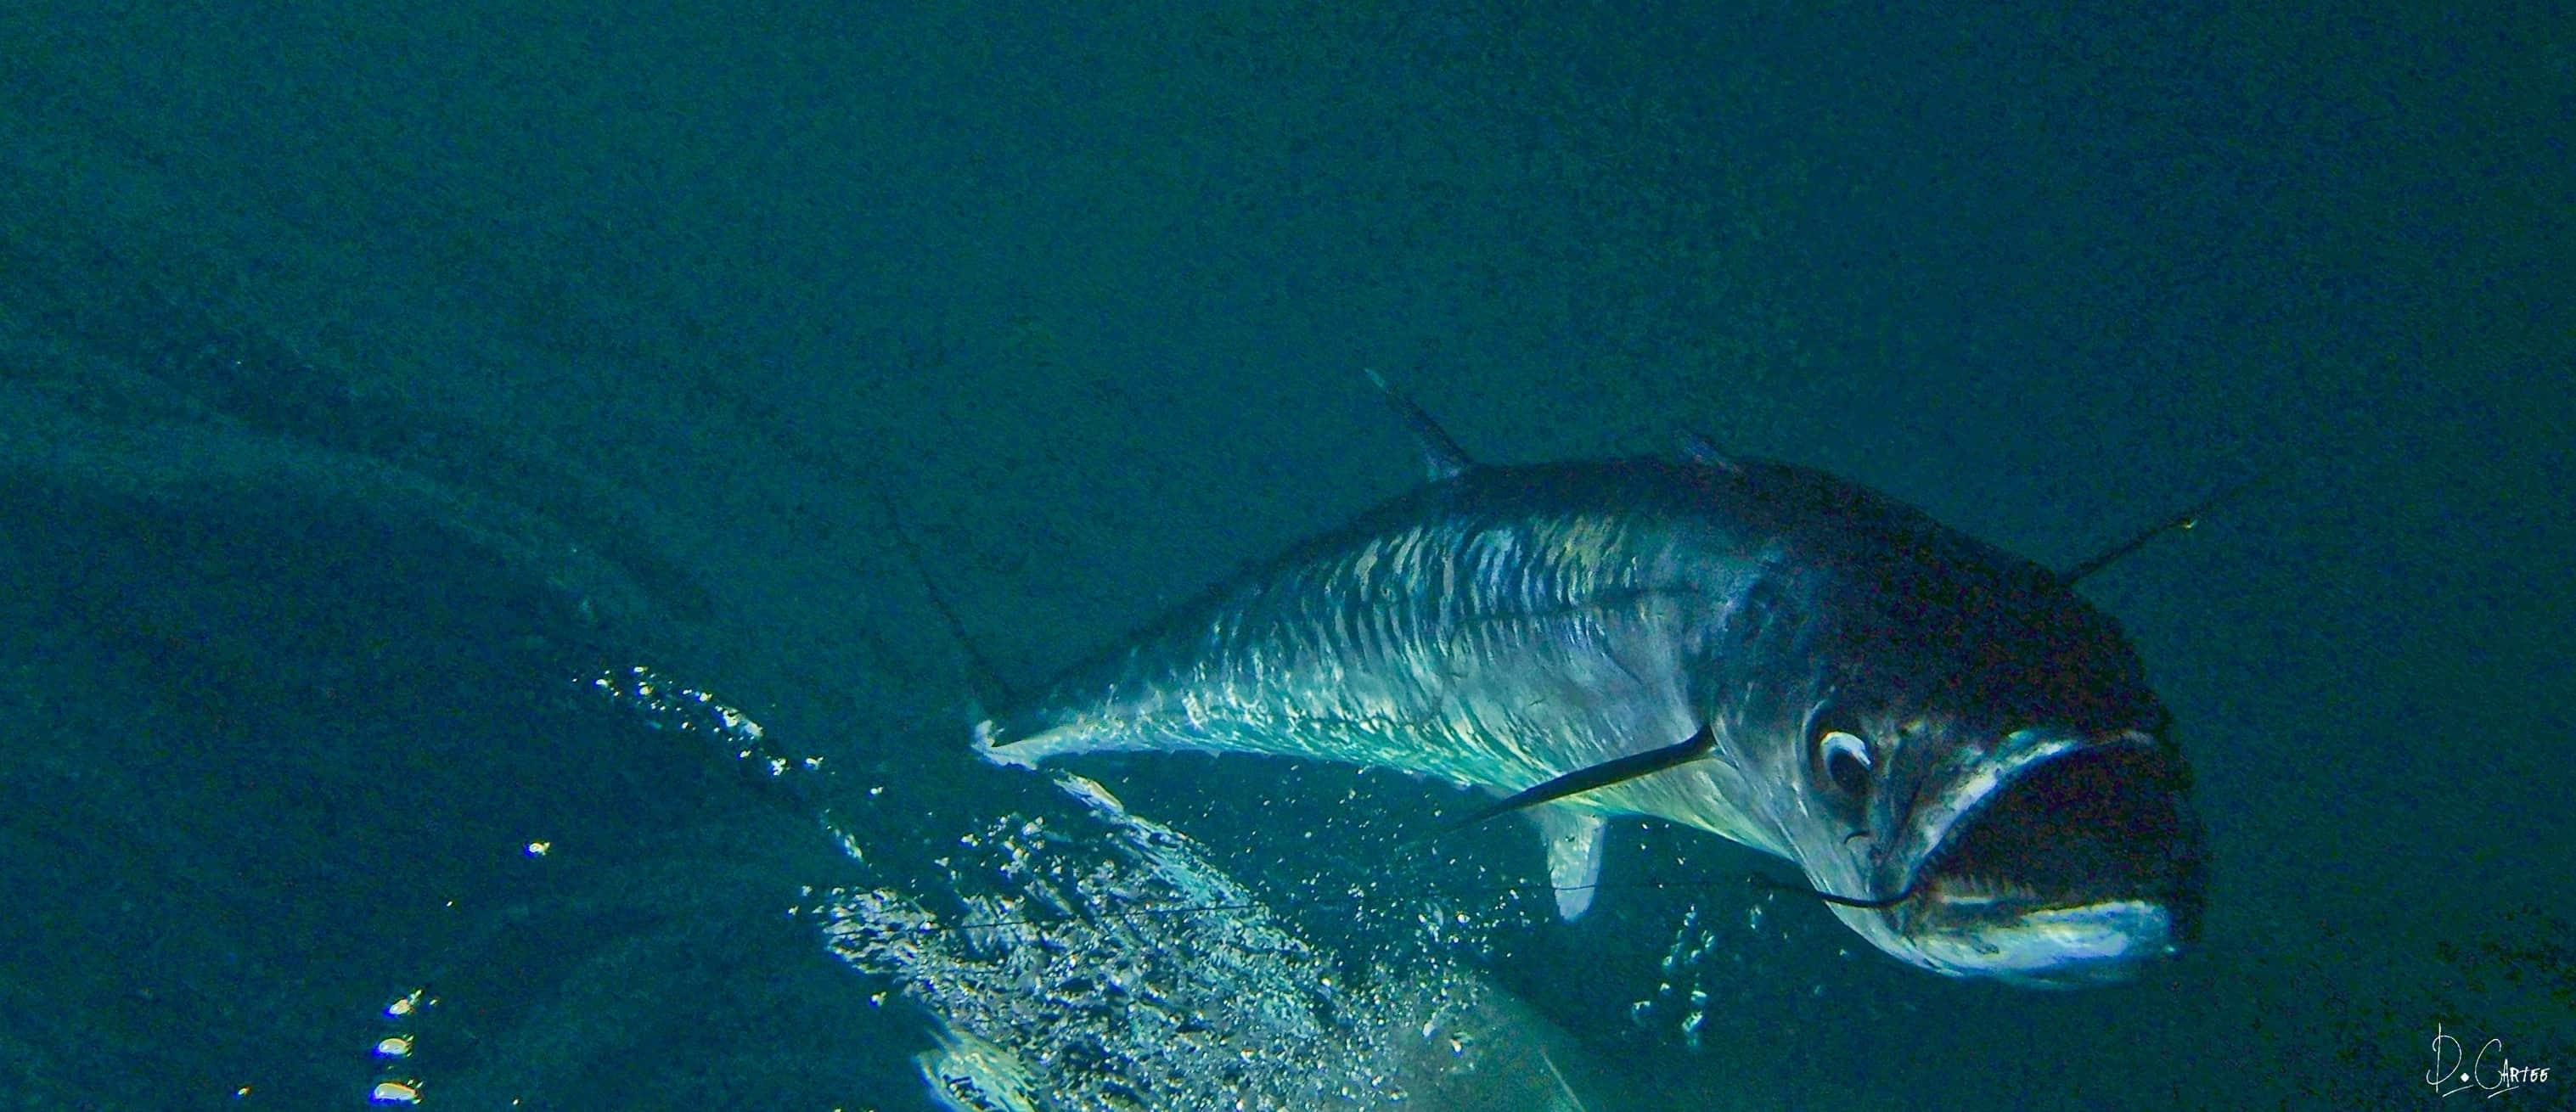 Kingfish on the line